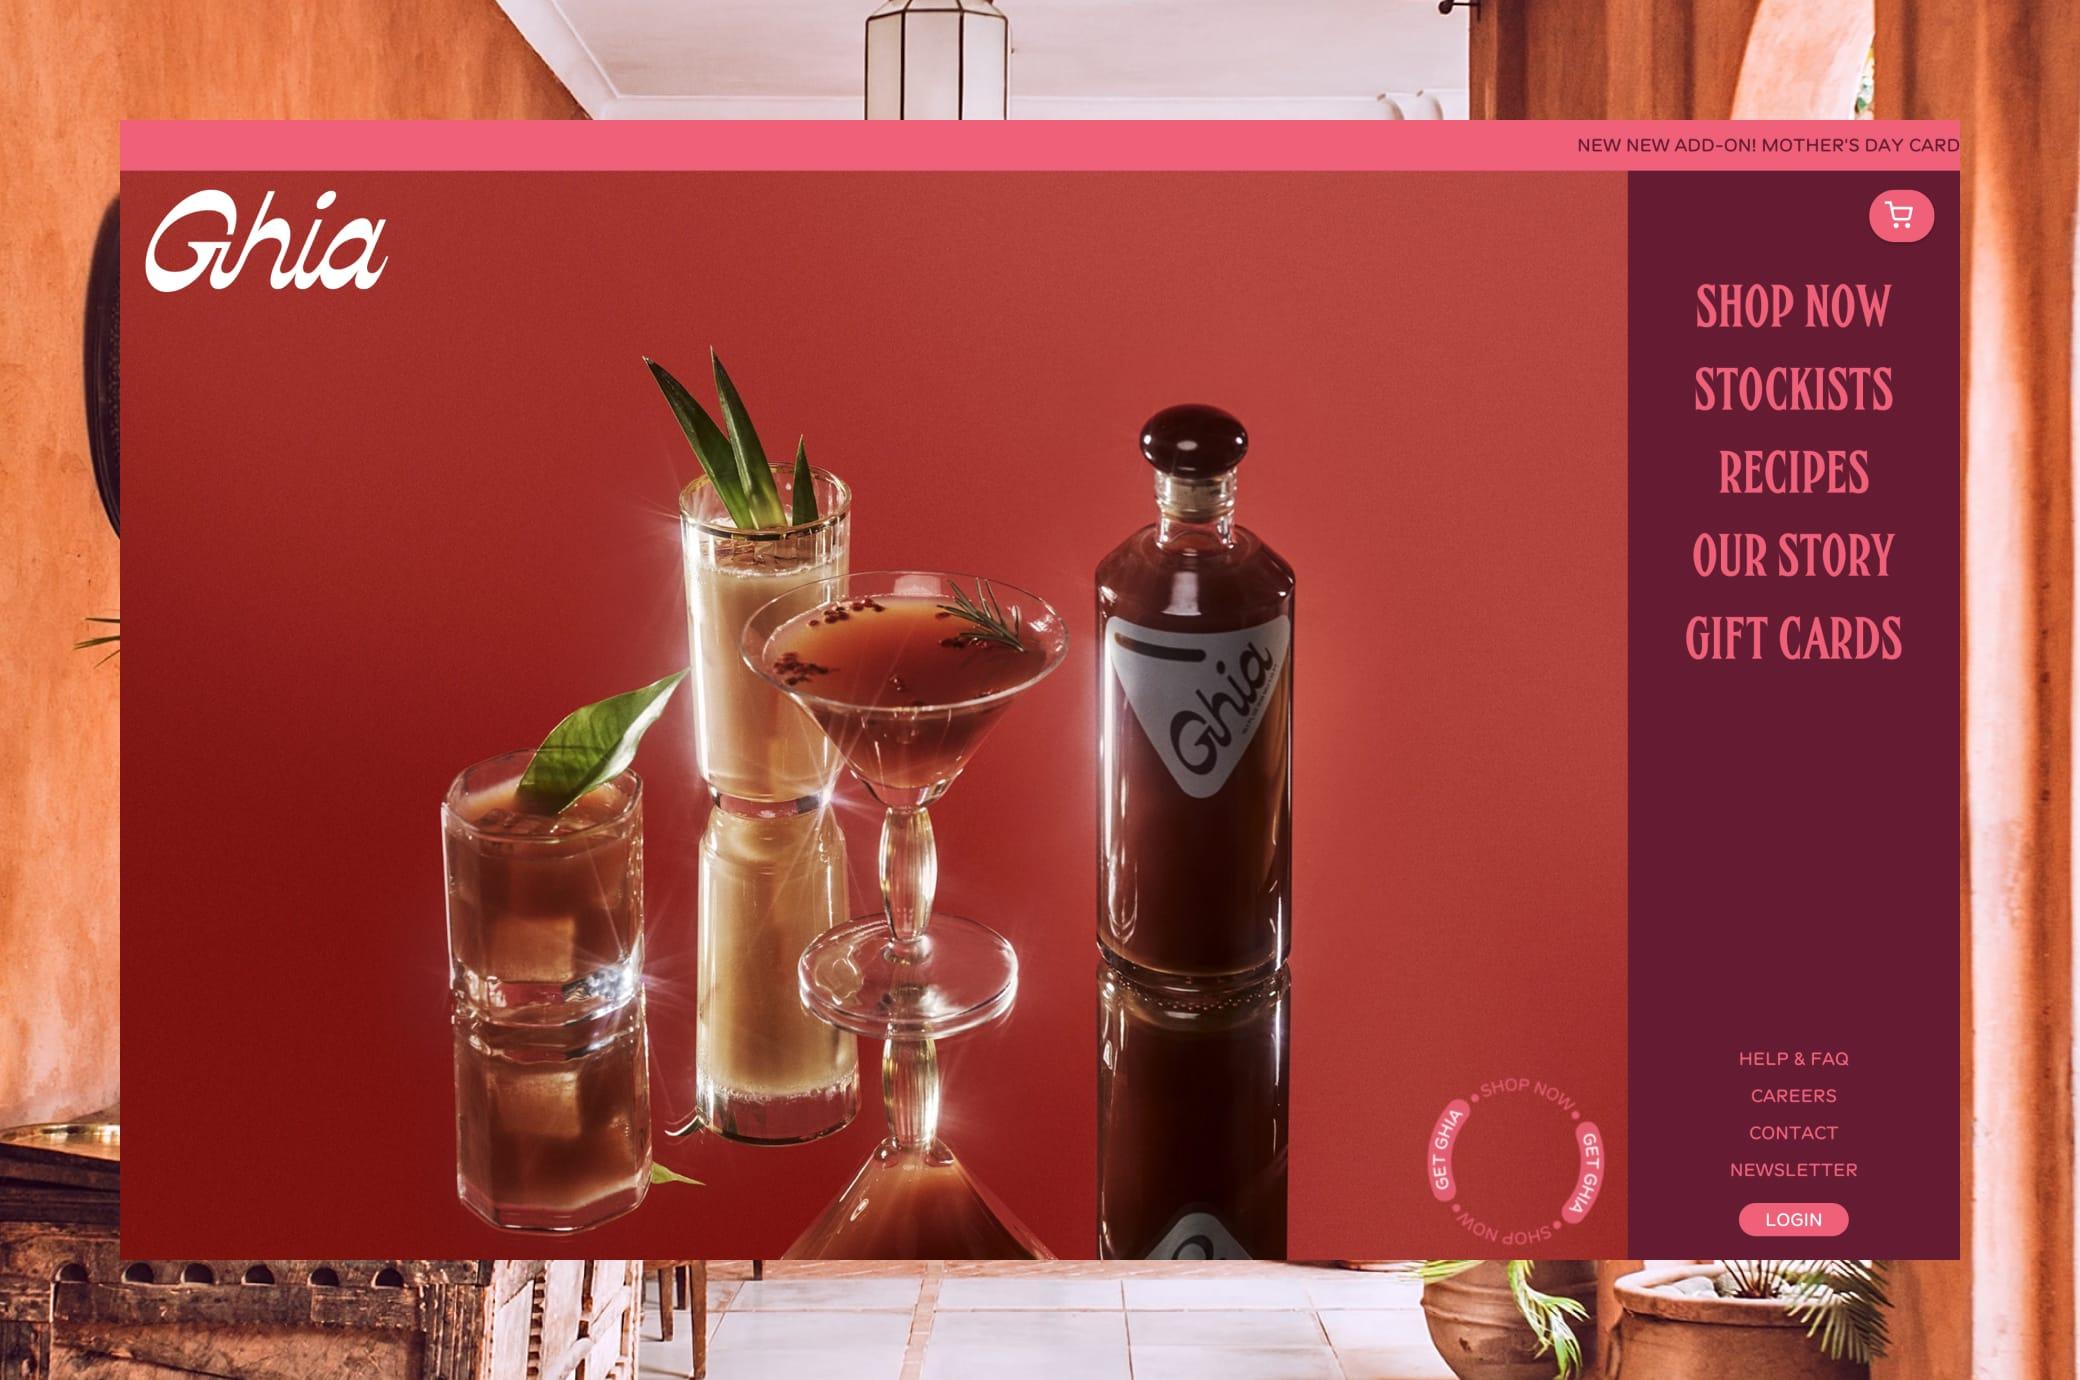 drinkghia.com home page screenshot in browser window